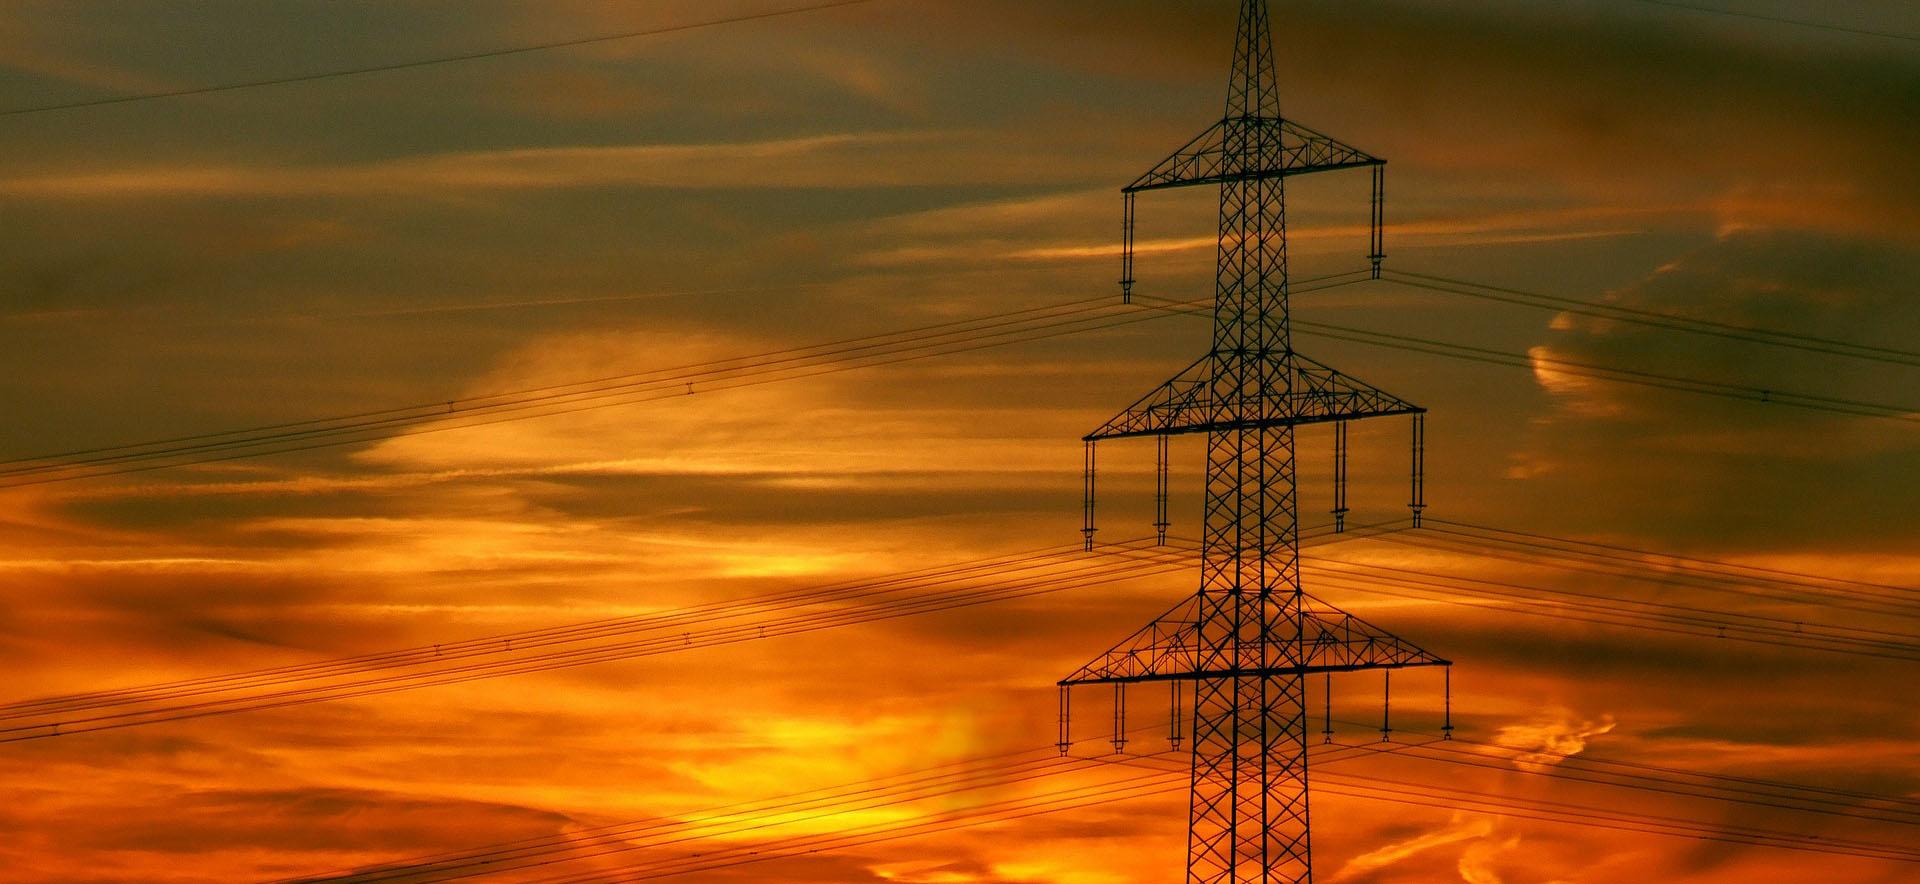 Energy Industry